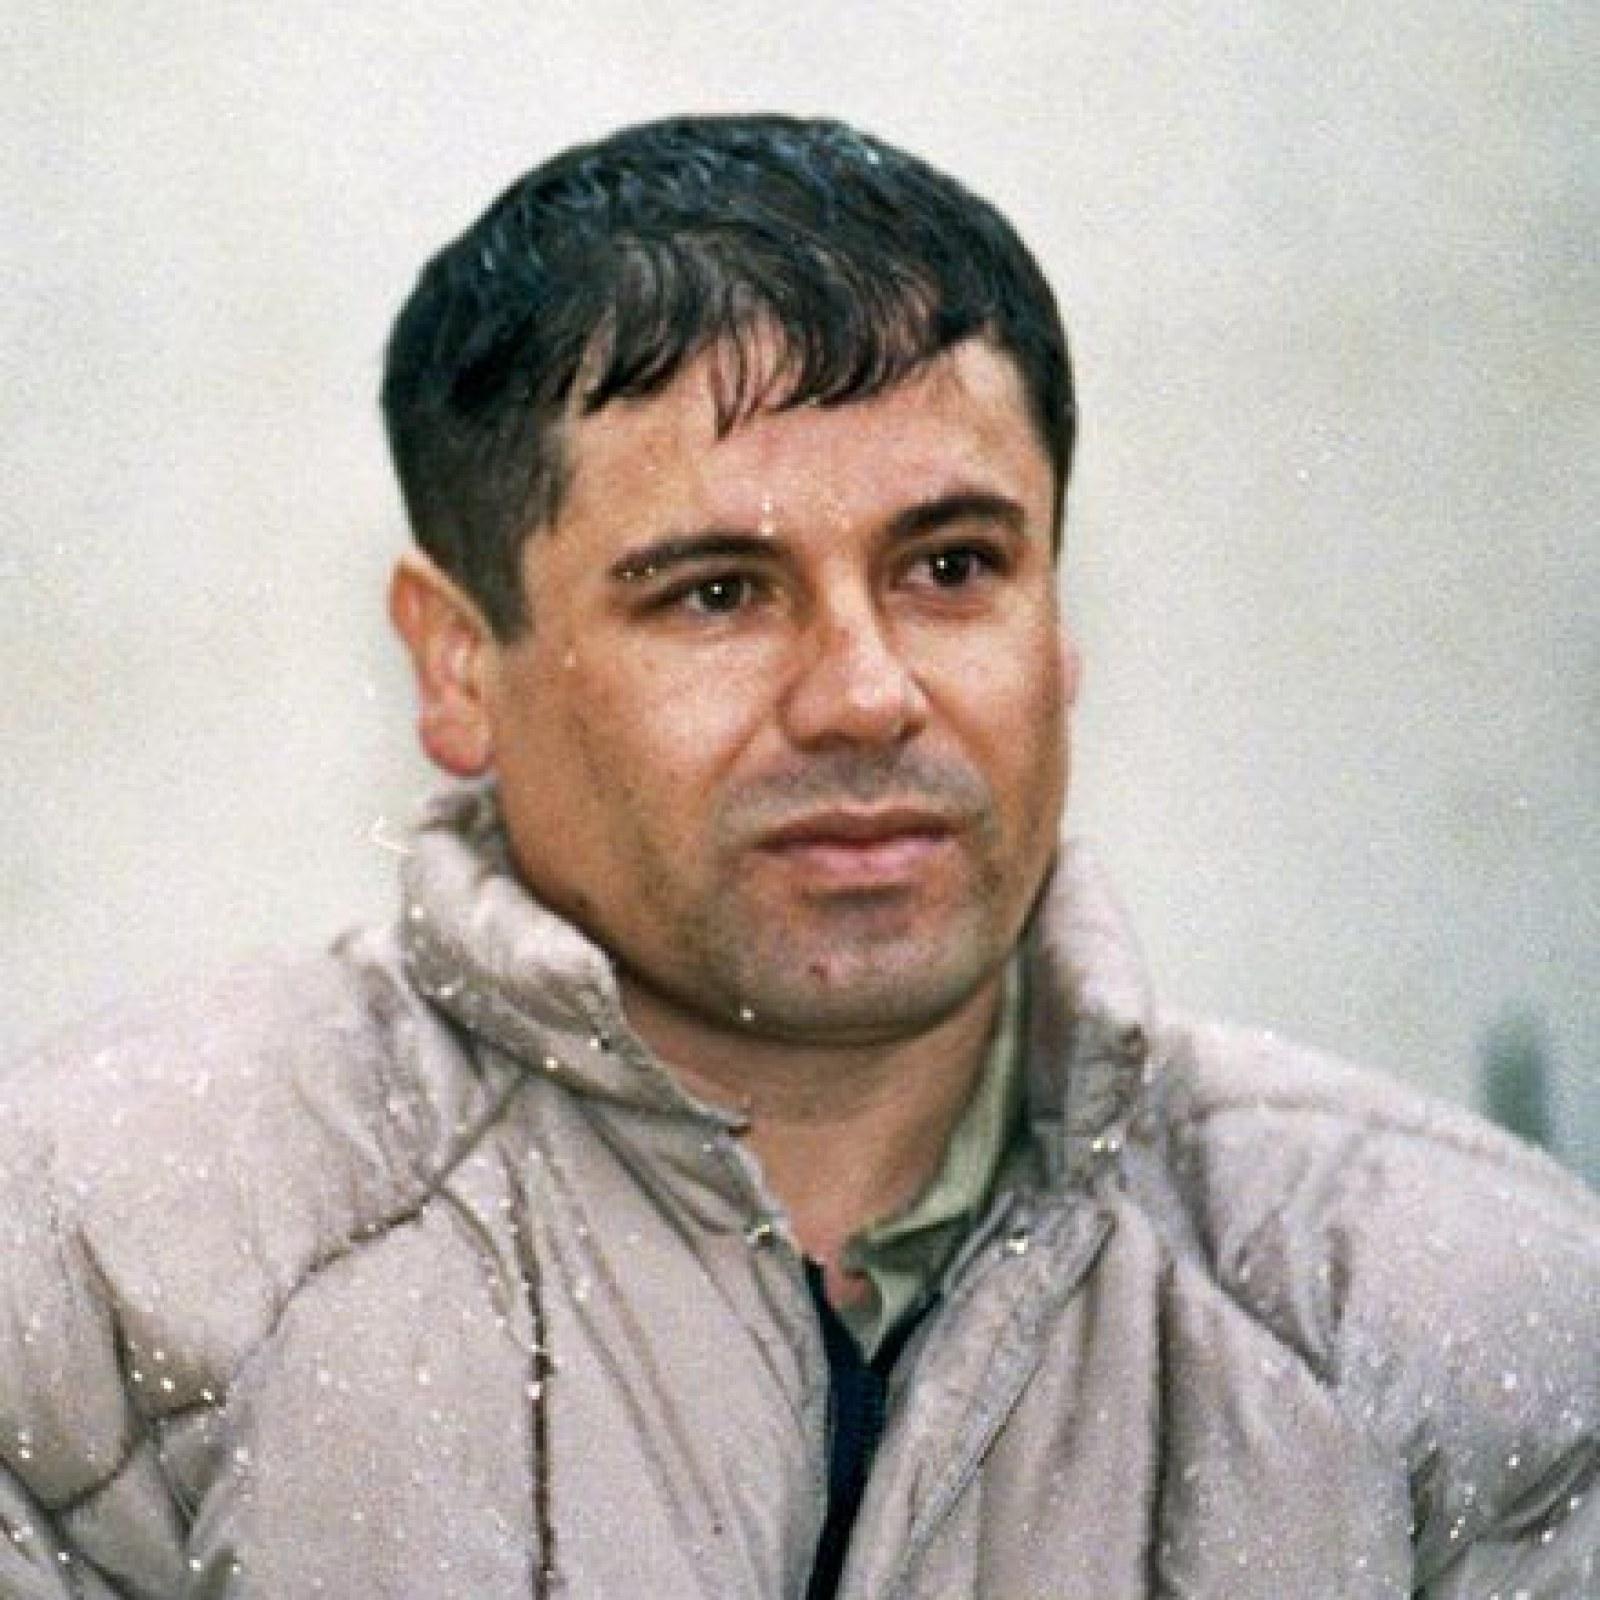 El Chapo' Guzmán, Mexico's Most Powerful Drug Lord